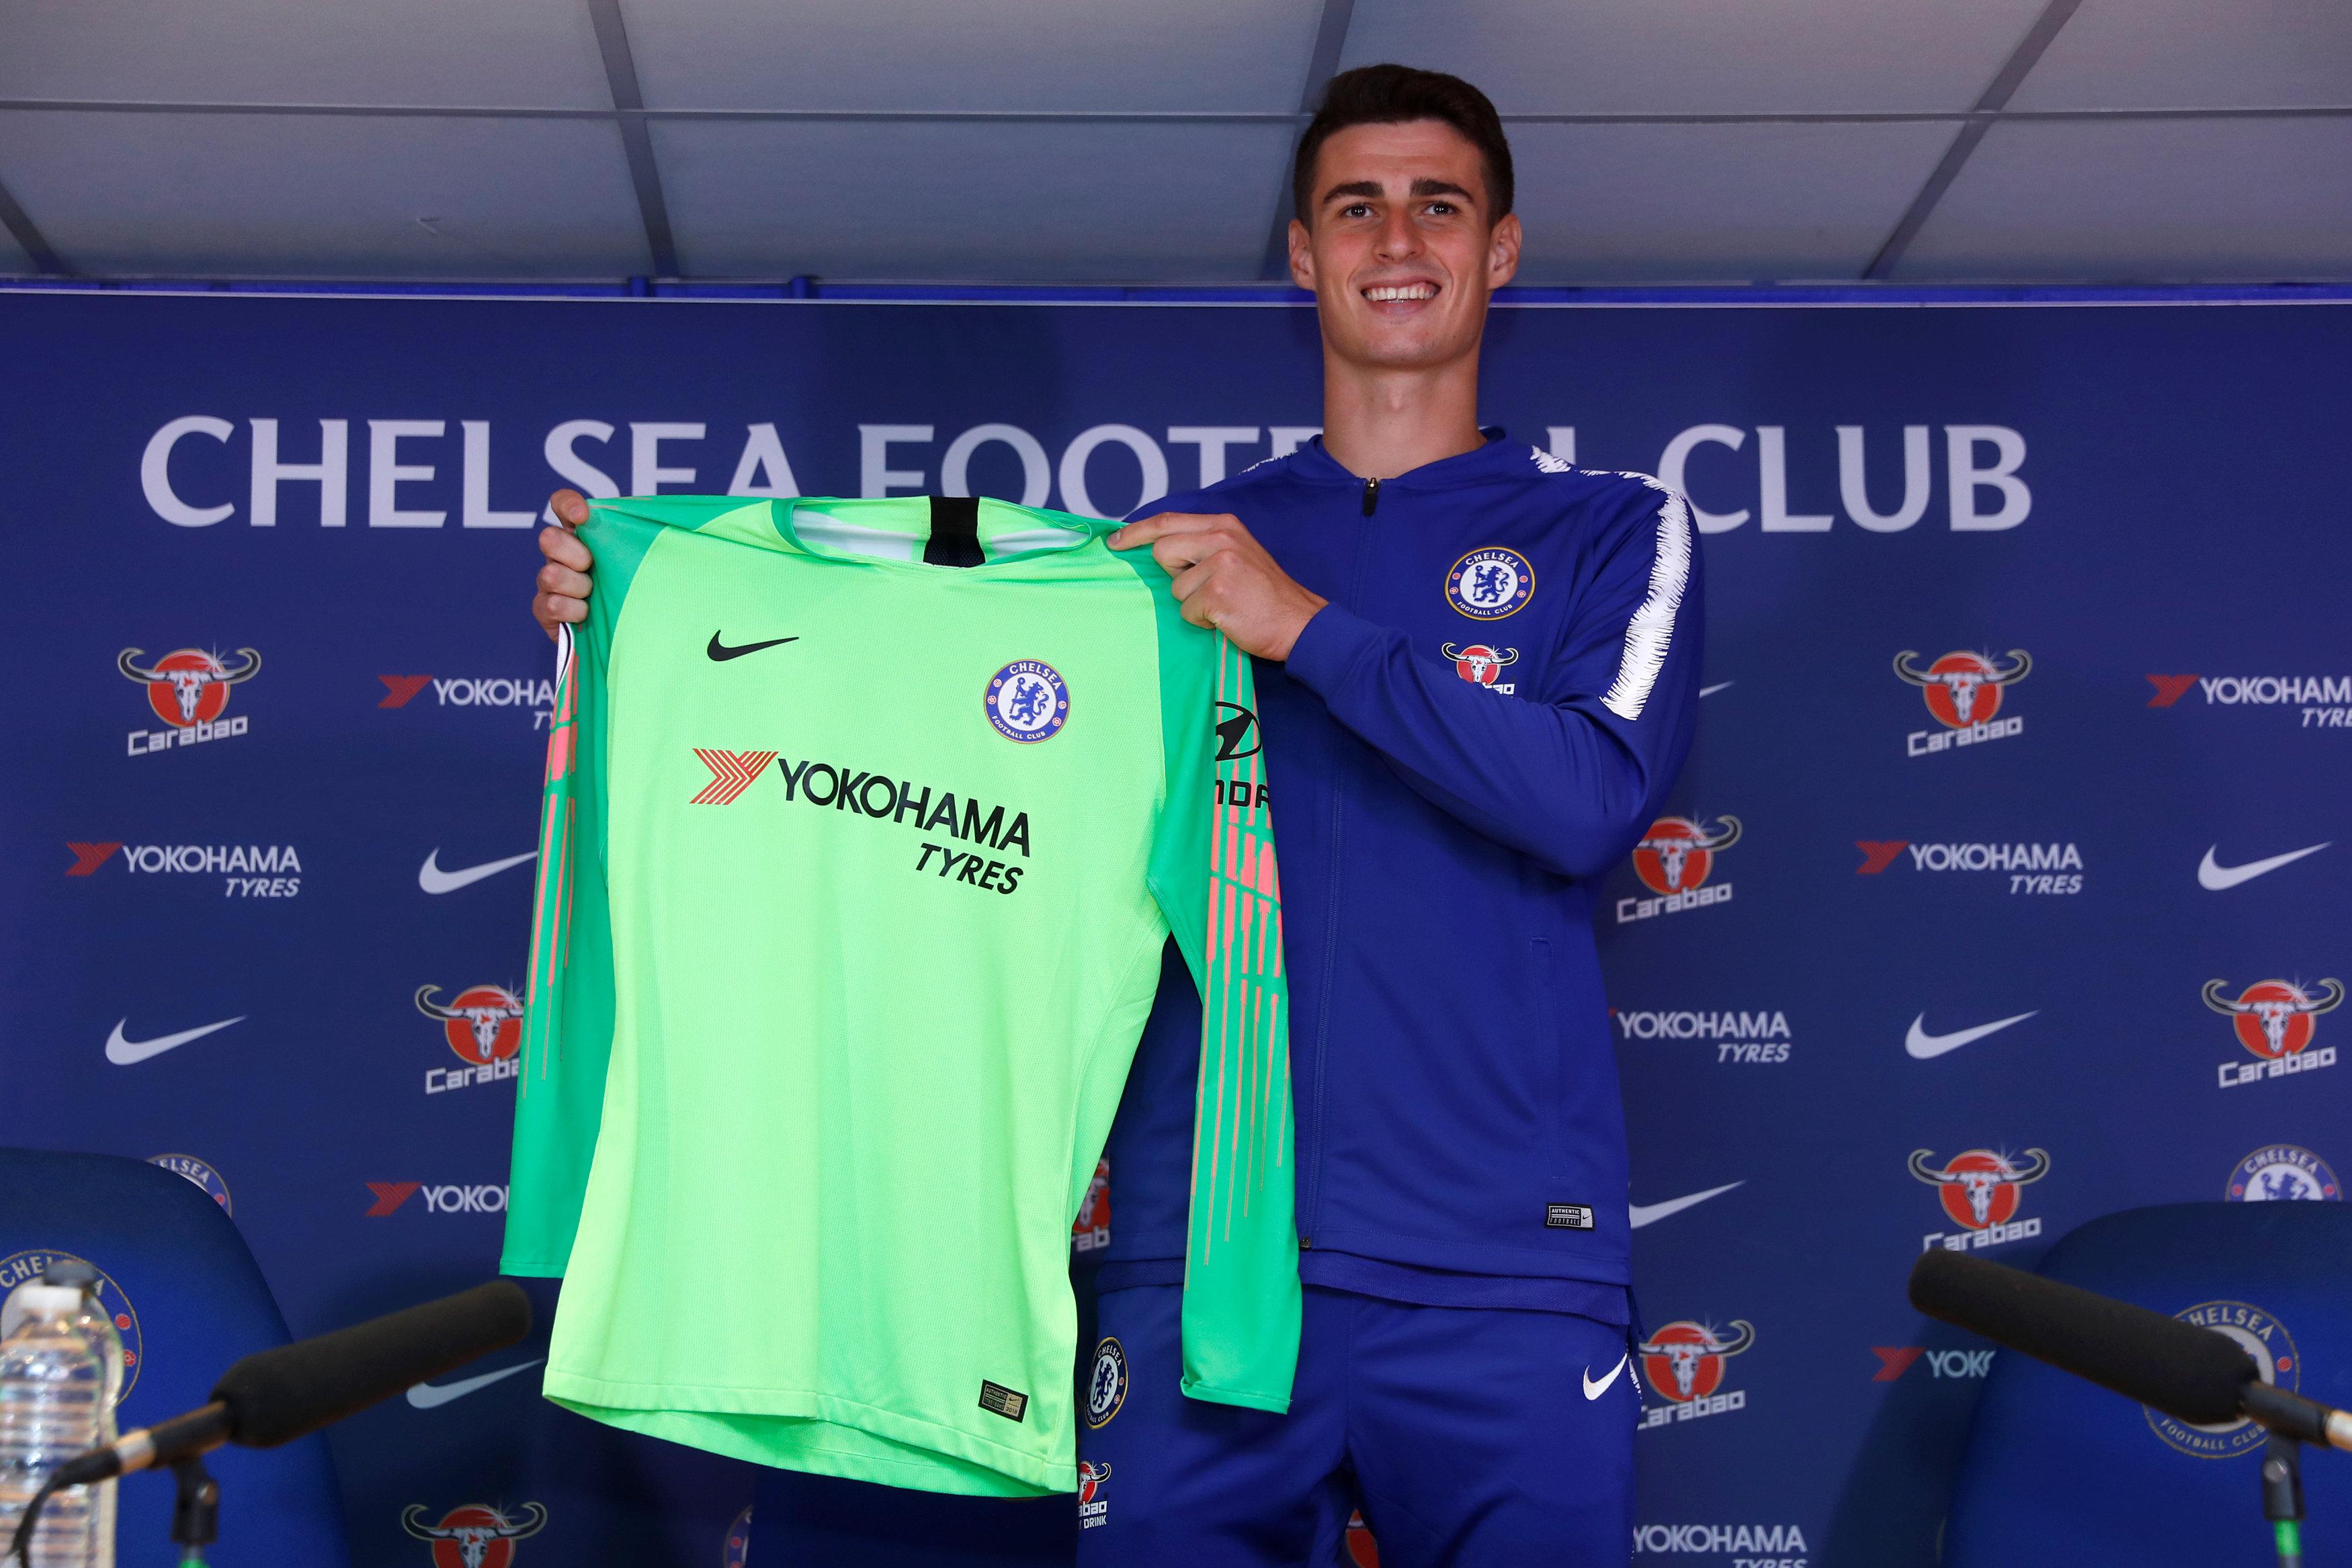 Chelsea signing Kepa